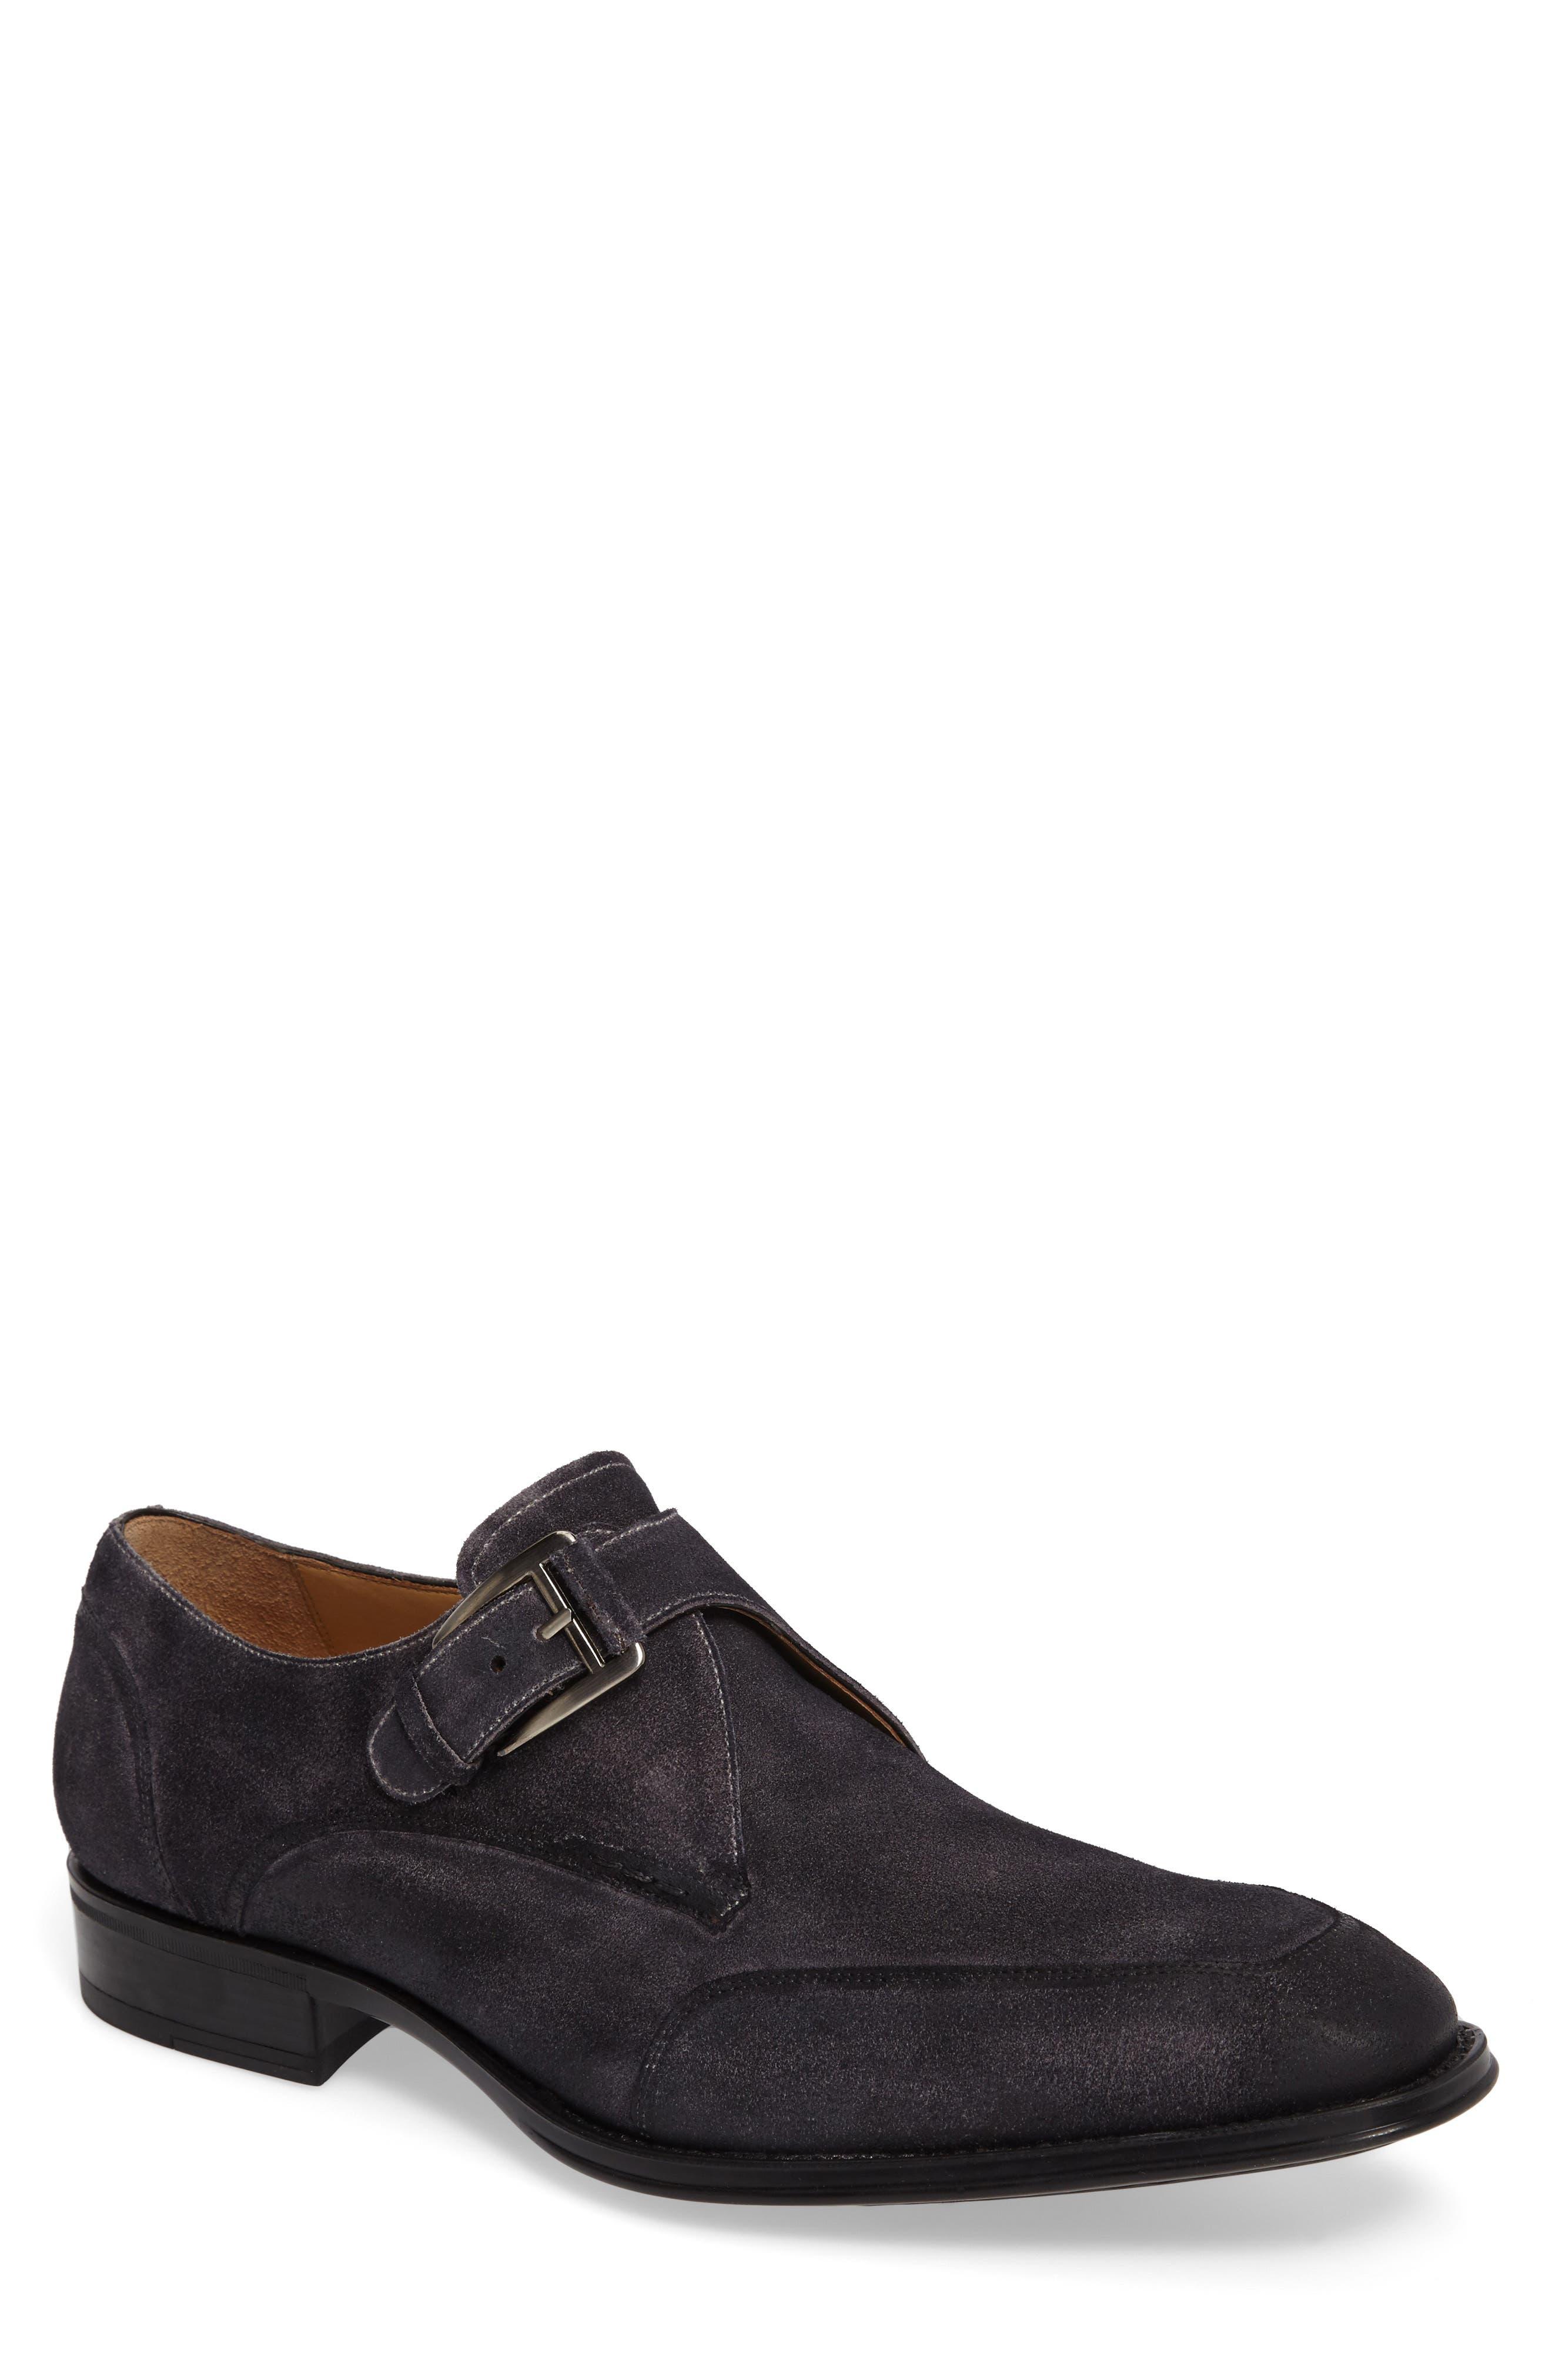 Alternate Image 1 Selected - Mezlan Baza Monk Strap Shoe (Men)